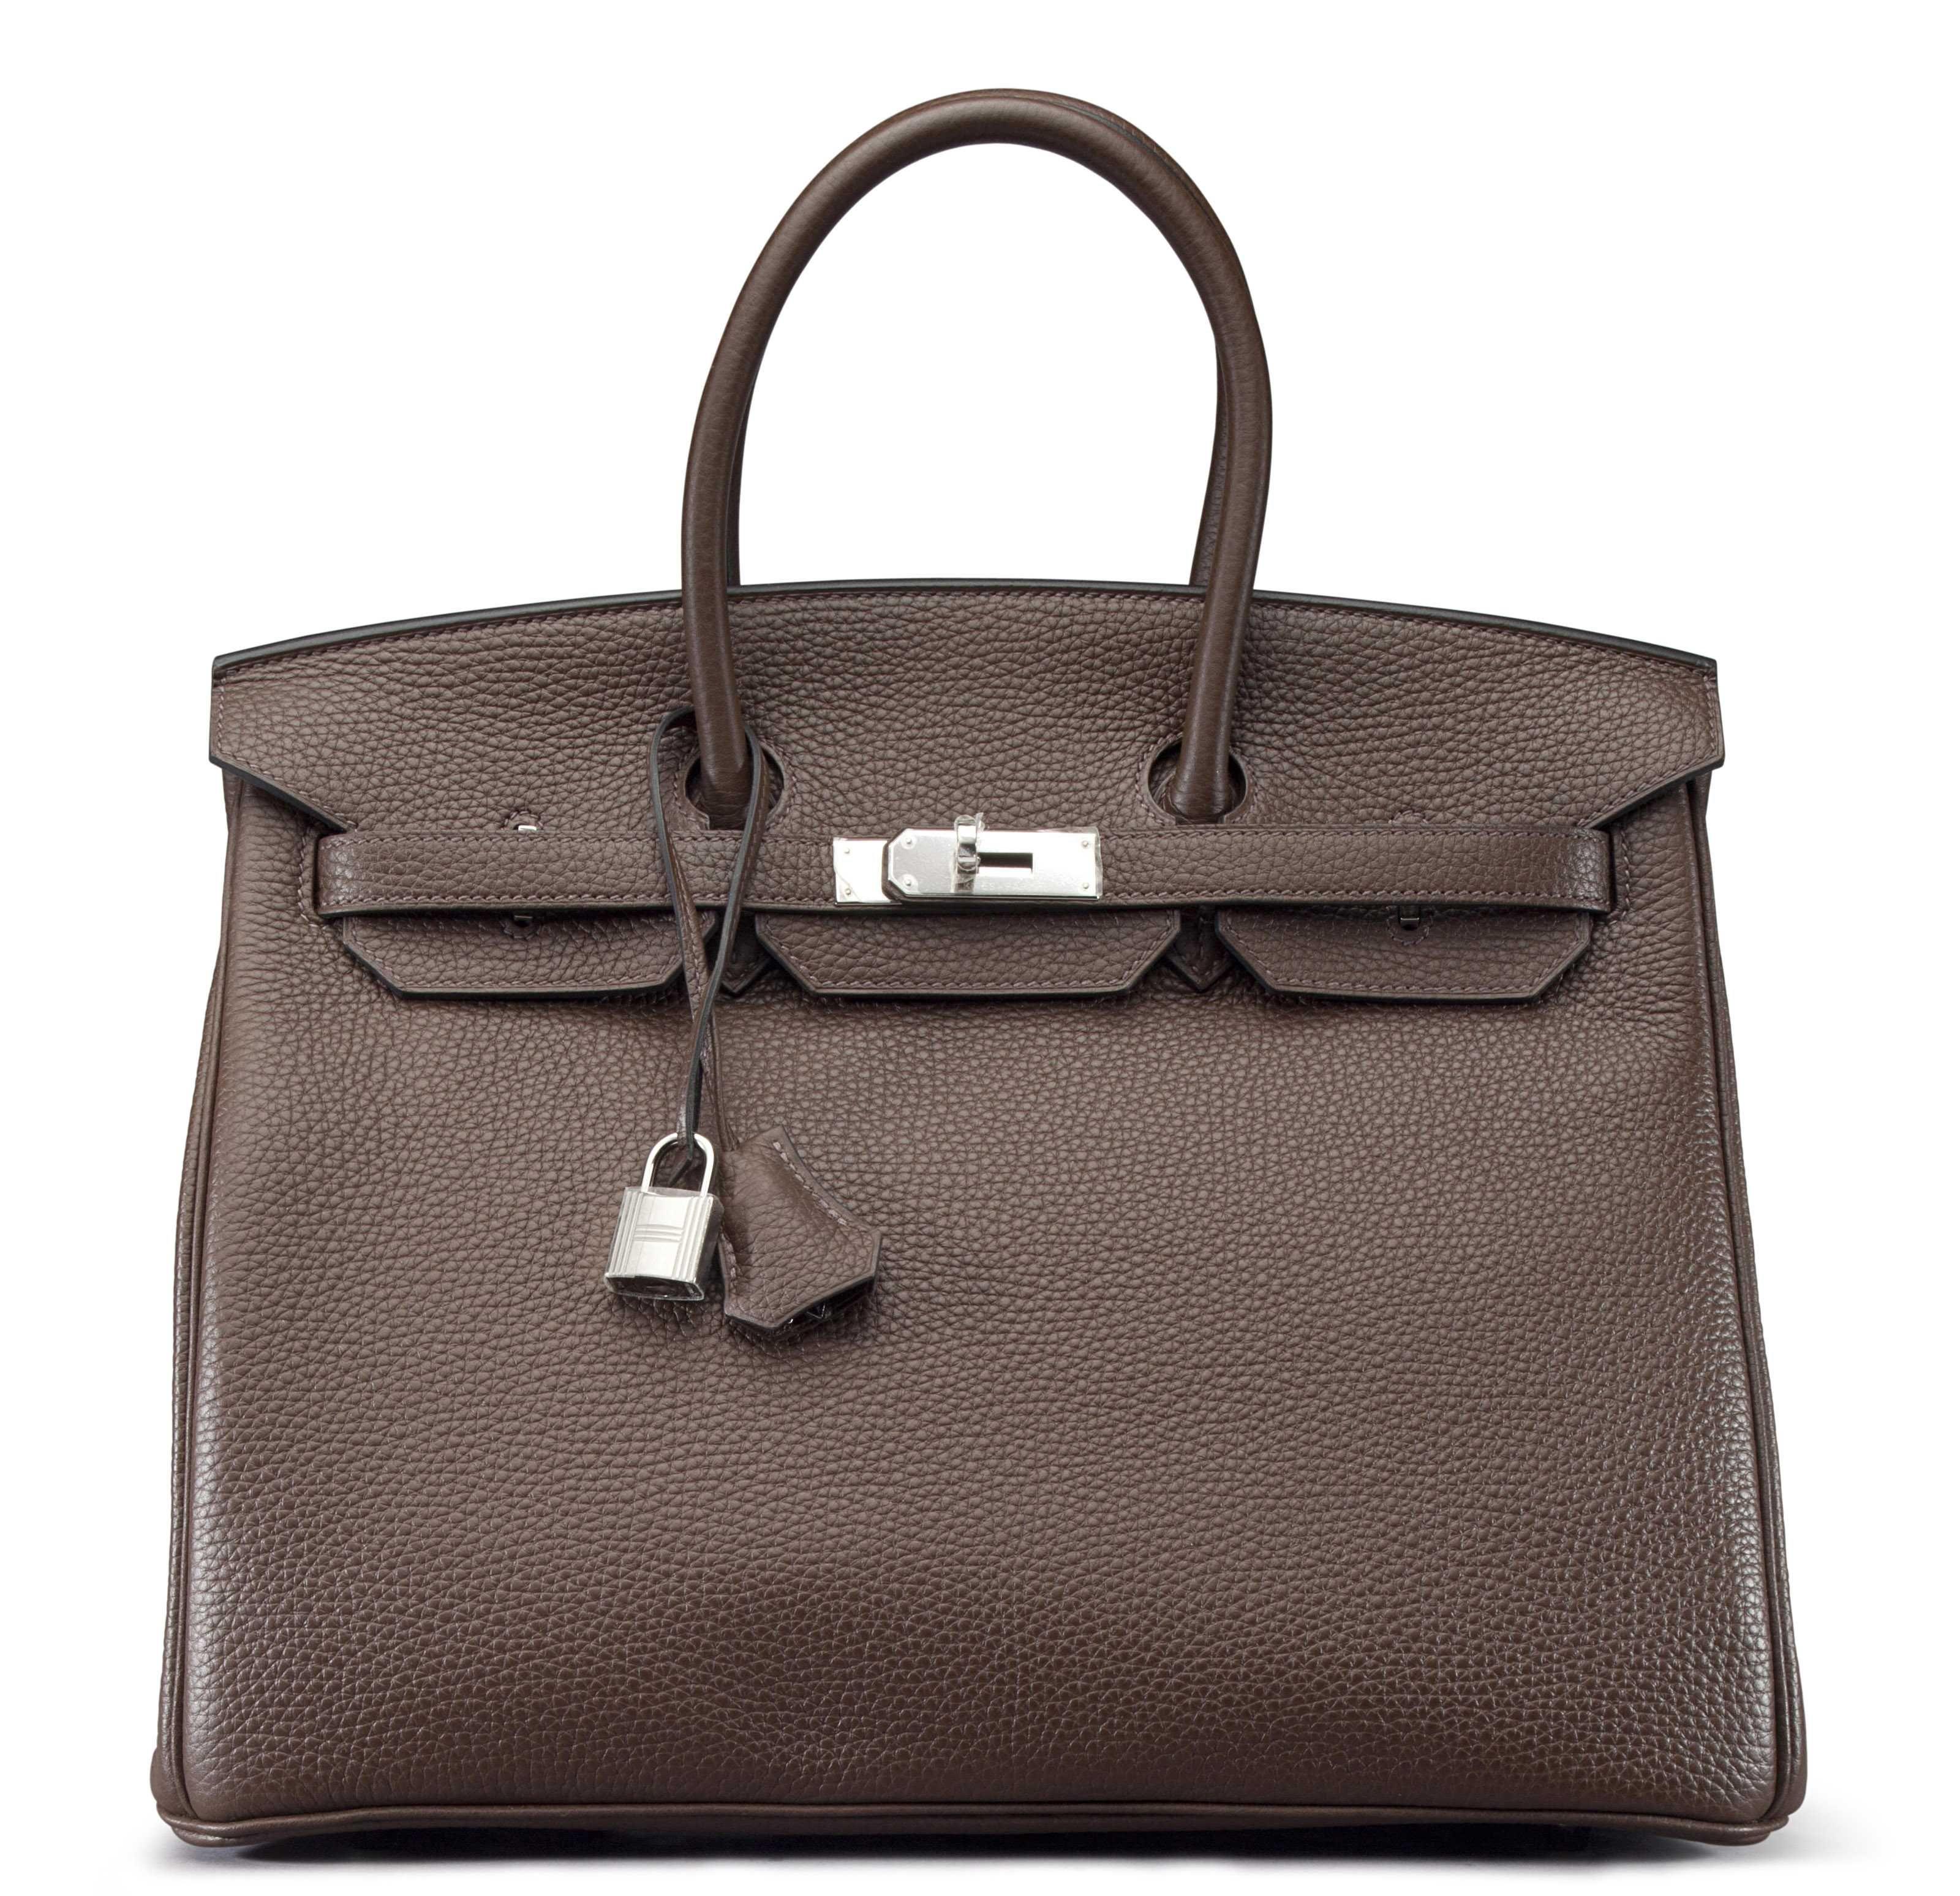 A 35cm Cocoan Clemence Leather Birkin Bag In 2019 Berkins